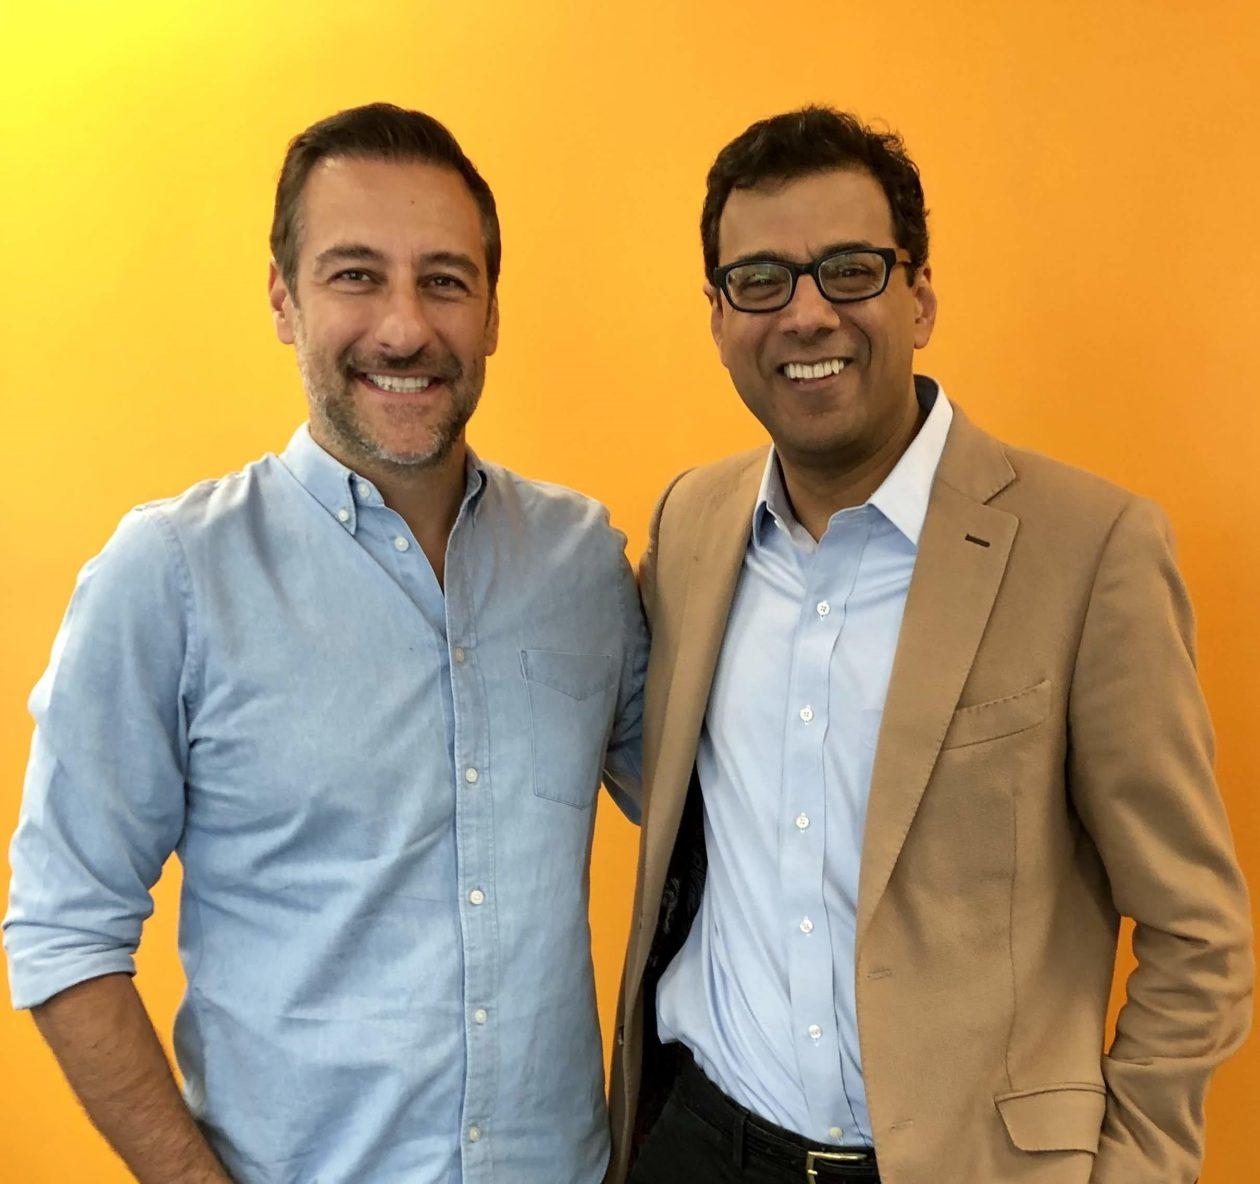 Amazon health care joint venture names Zocdoc executive as CTO, ramps up hiring